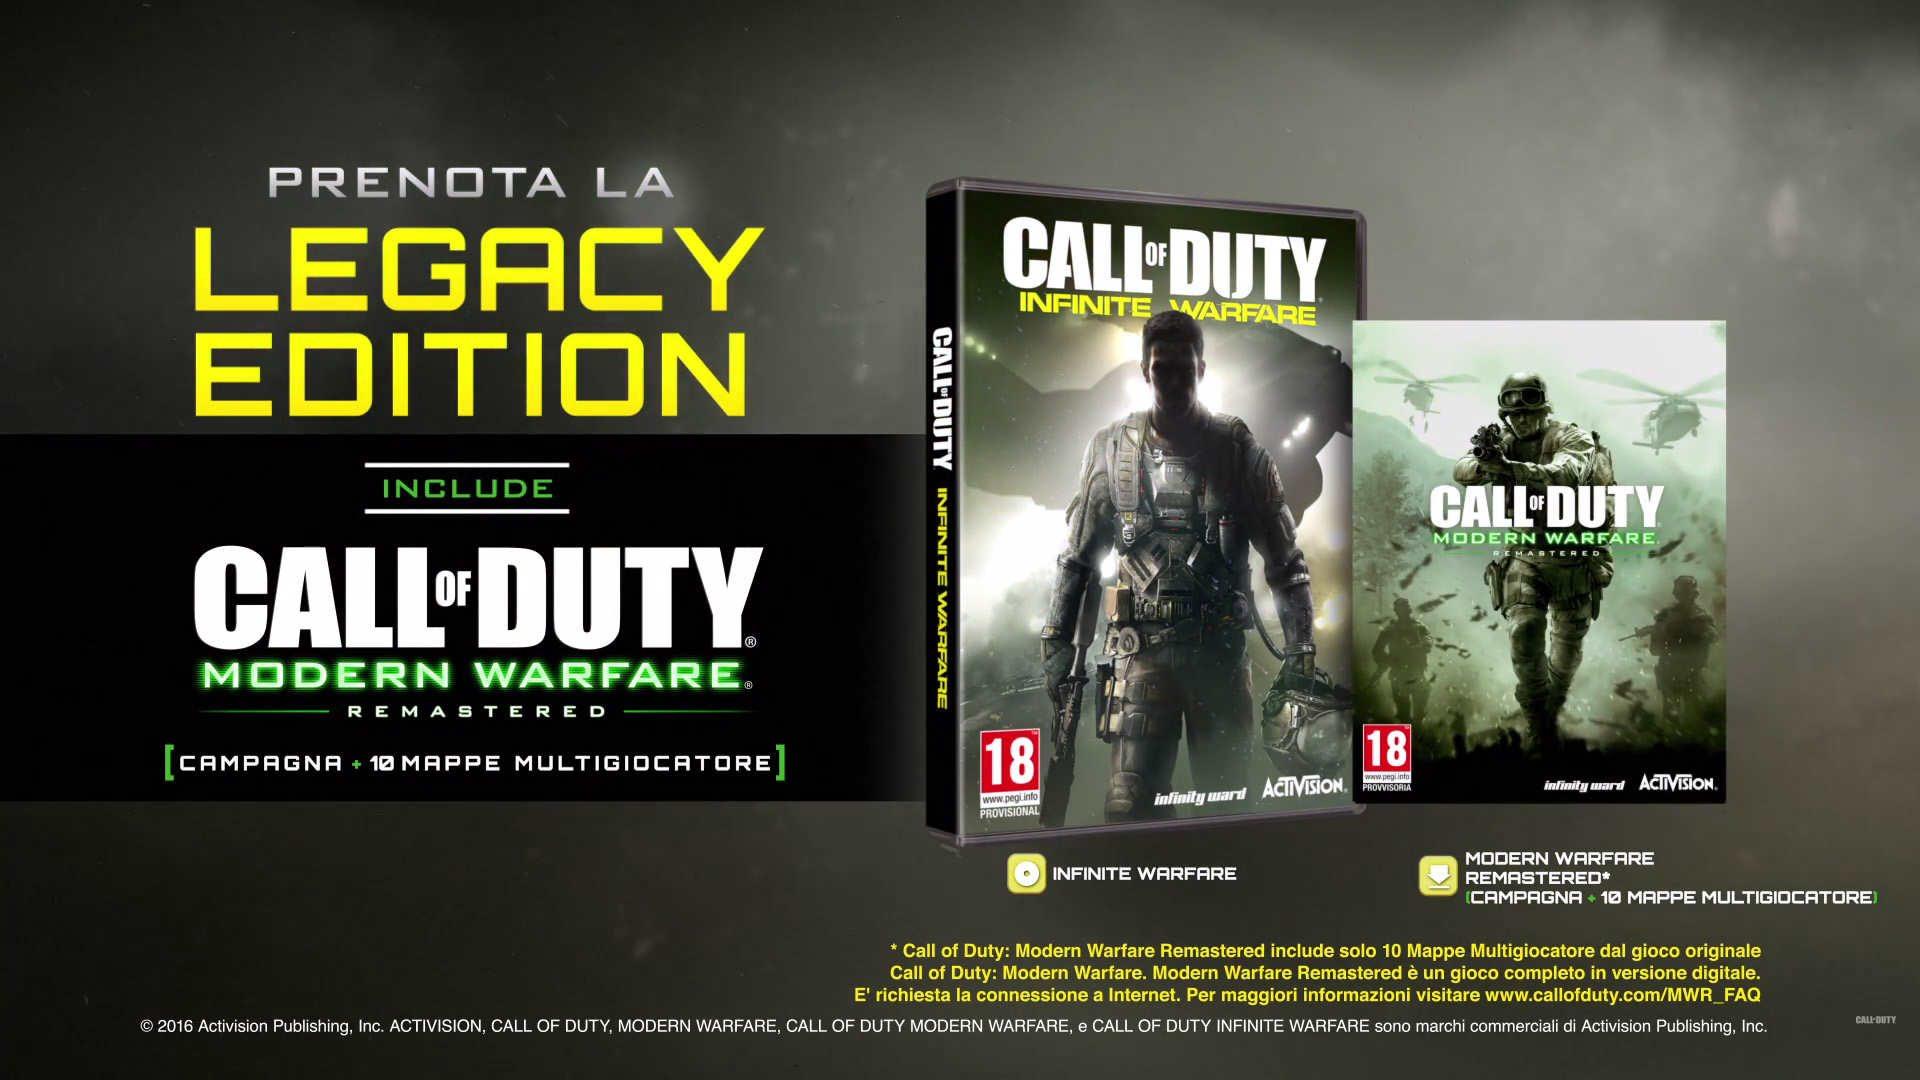 Call of Duty Infinite Warfare Legacy Edition